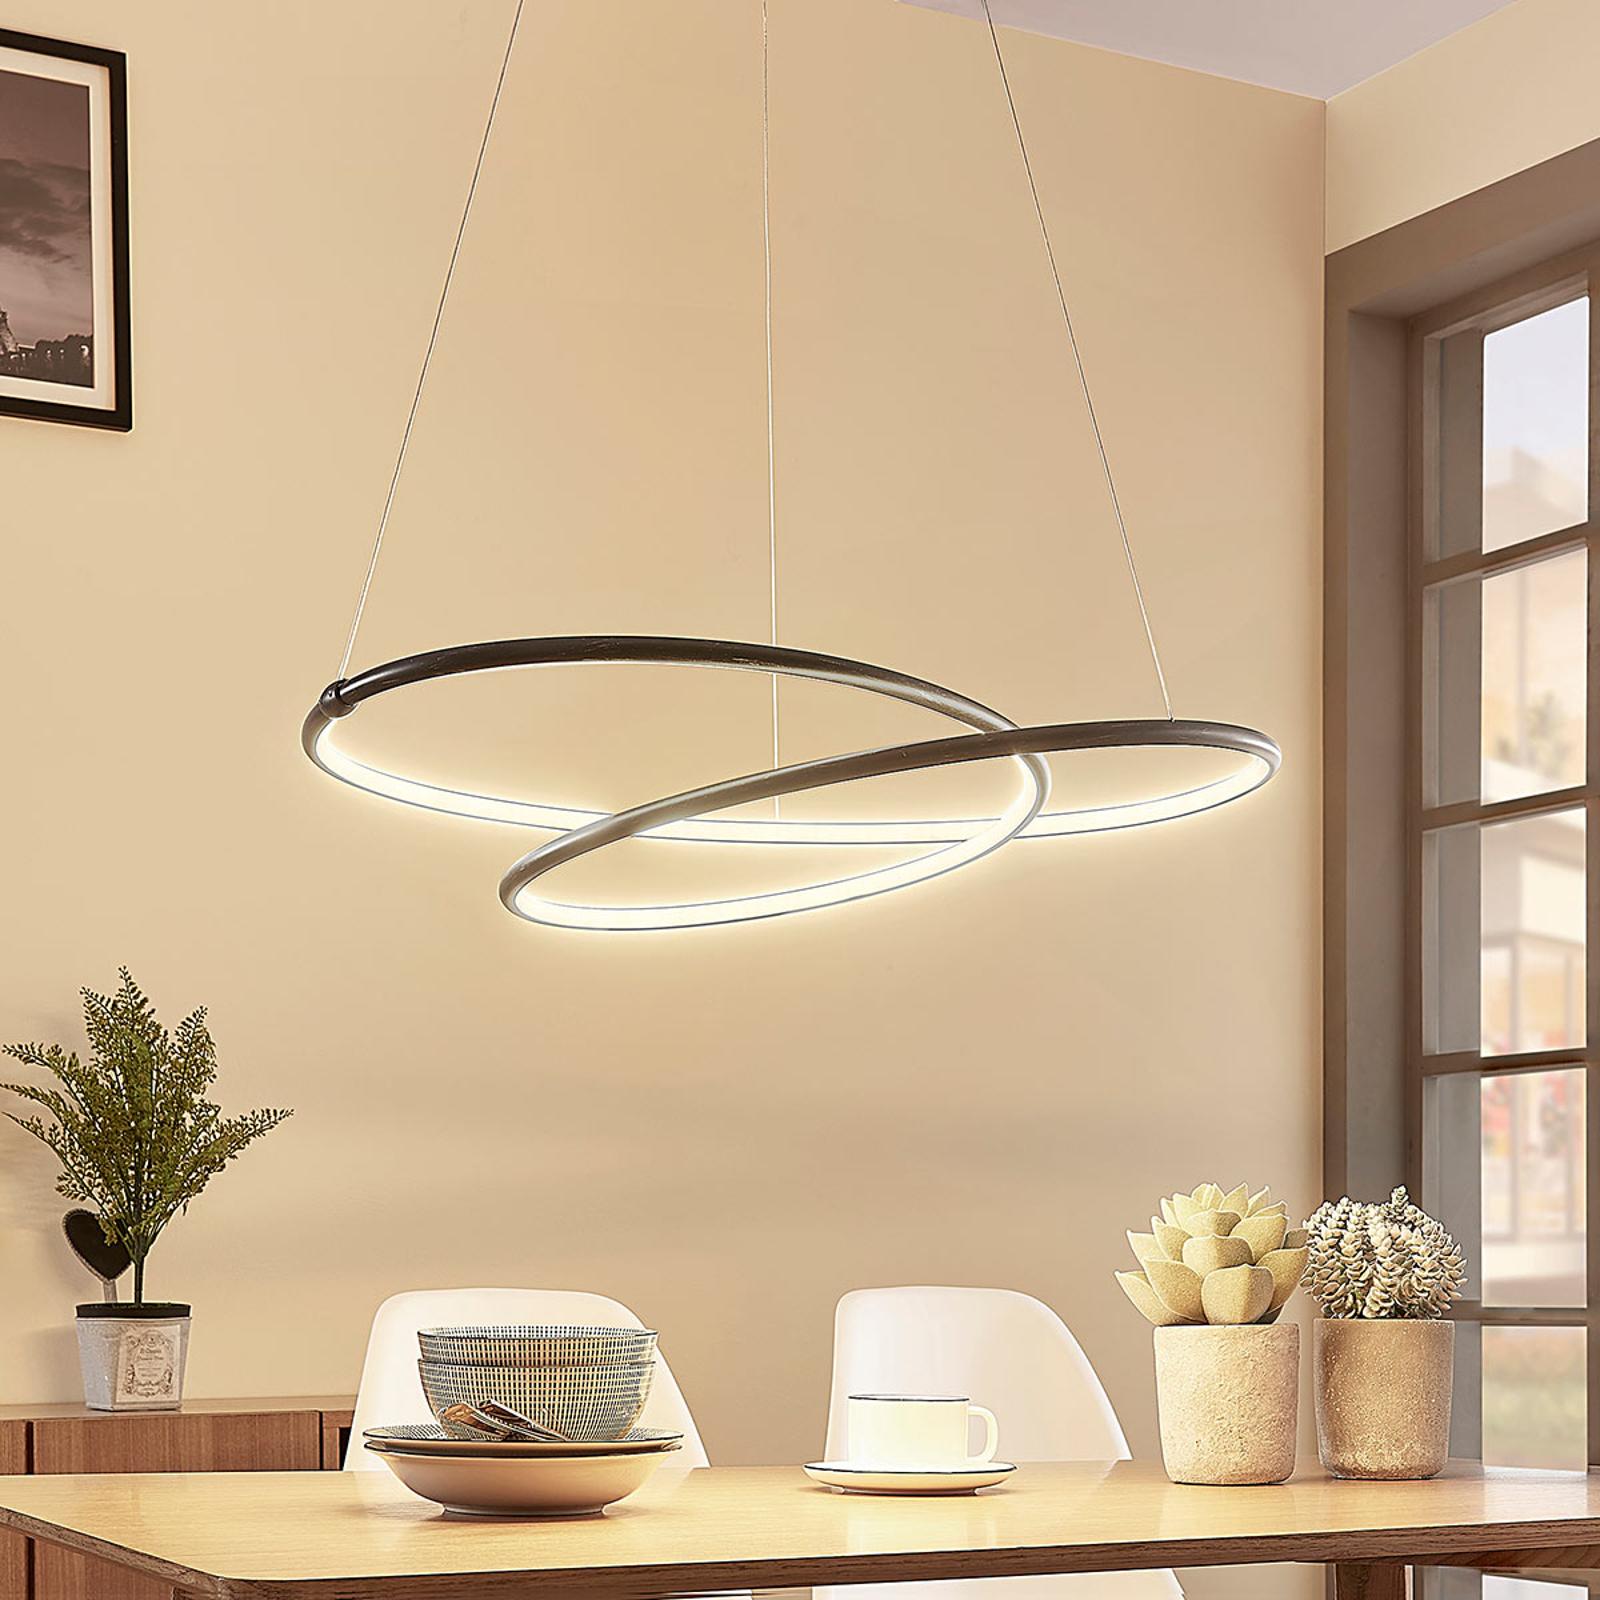 Suspension LED Mirasu noire et moderne